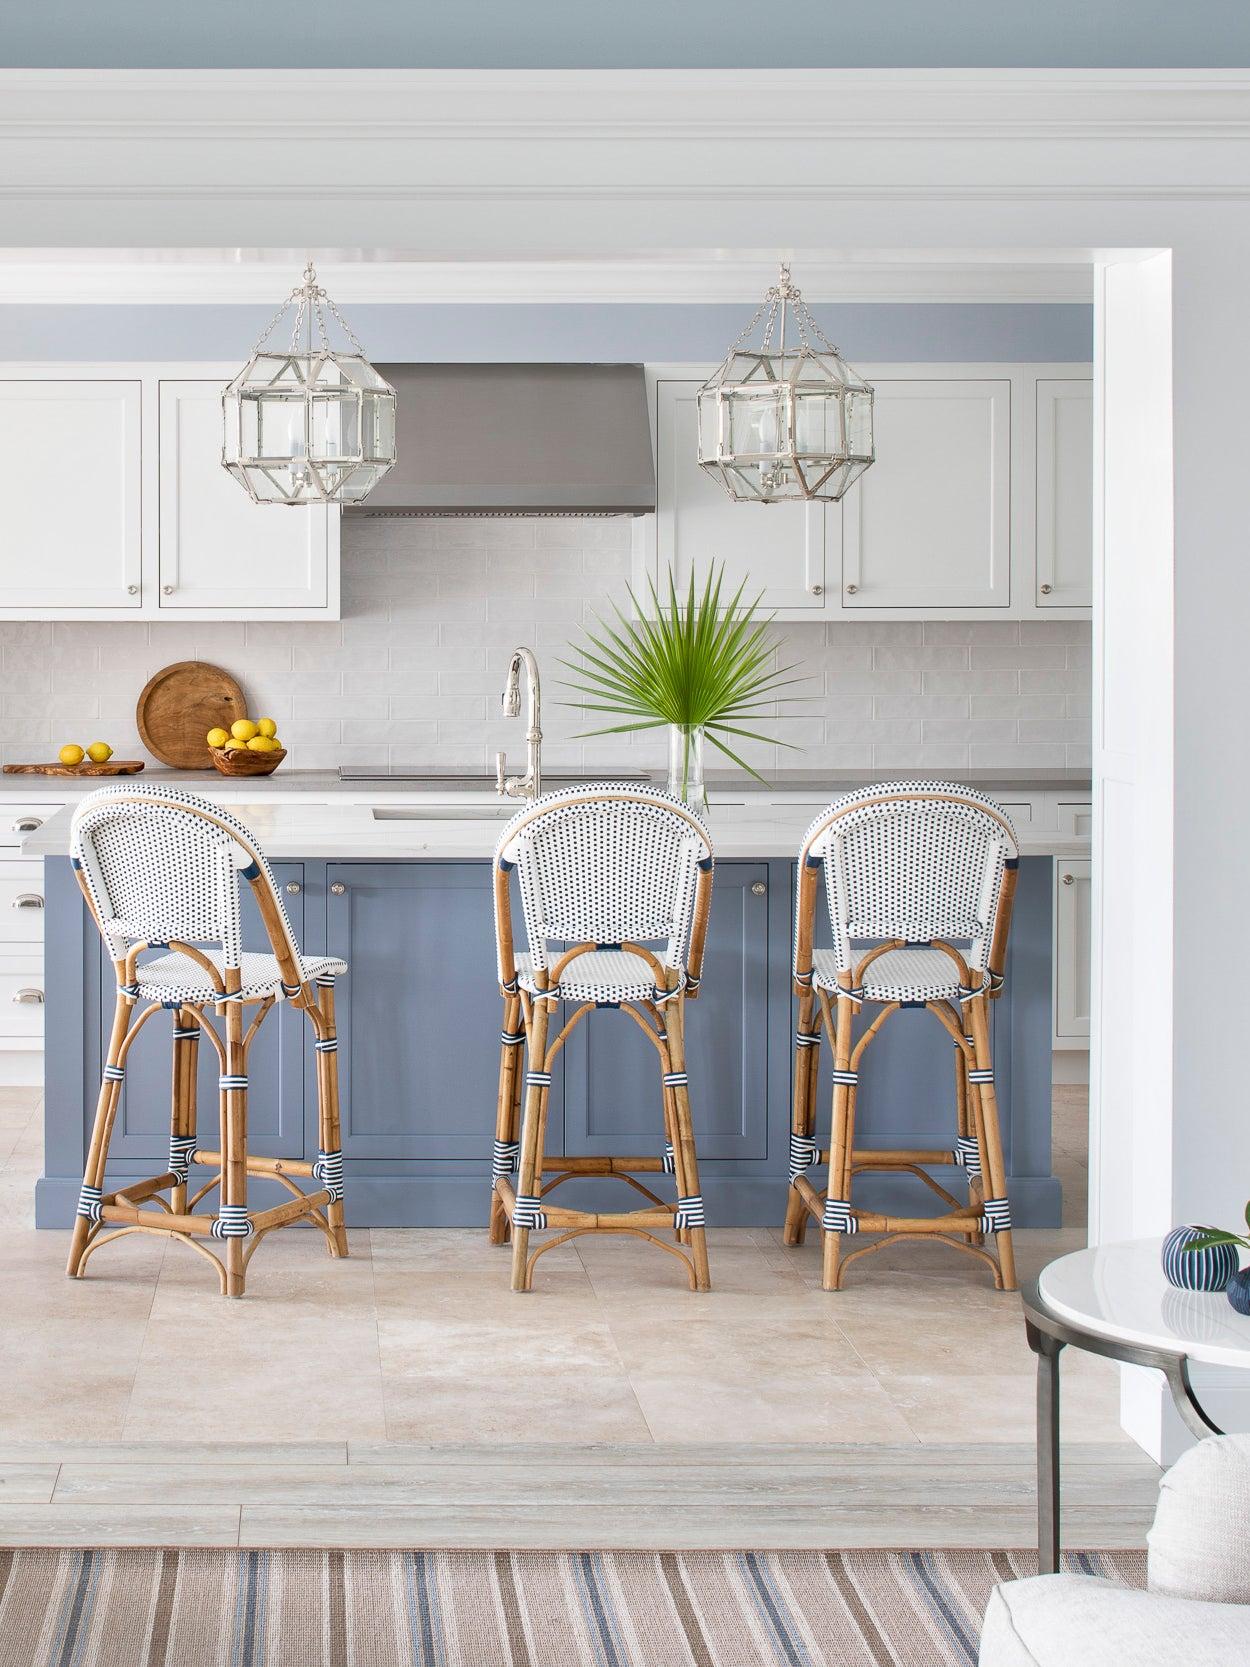 Fresh Corian® Quartz Materials take this Coastal Home from Drab to Fab